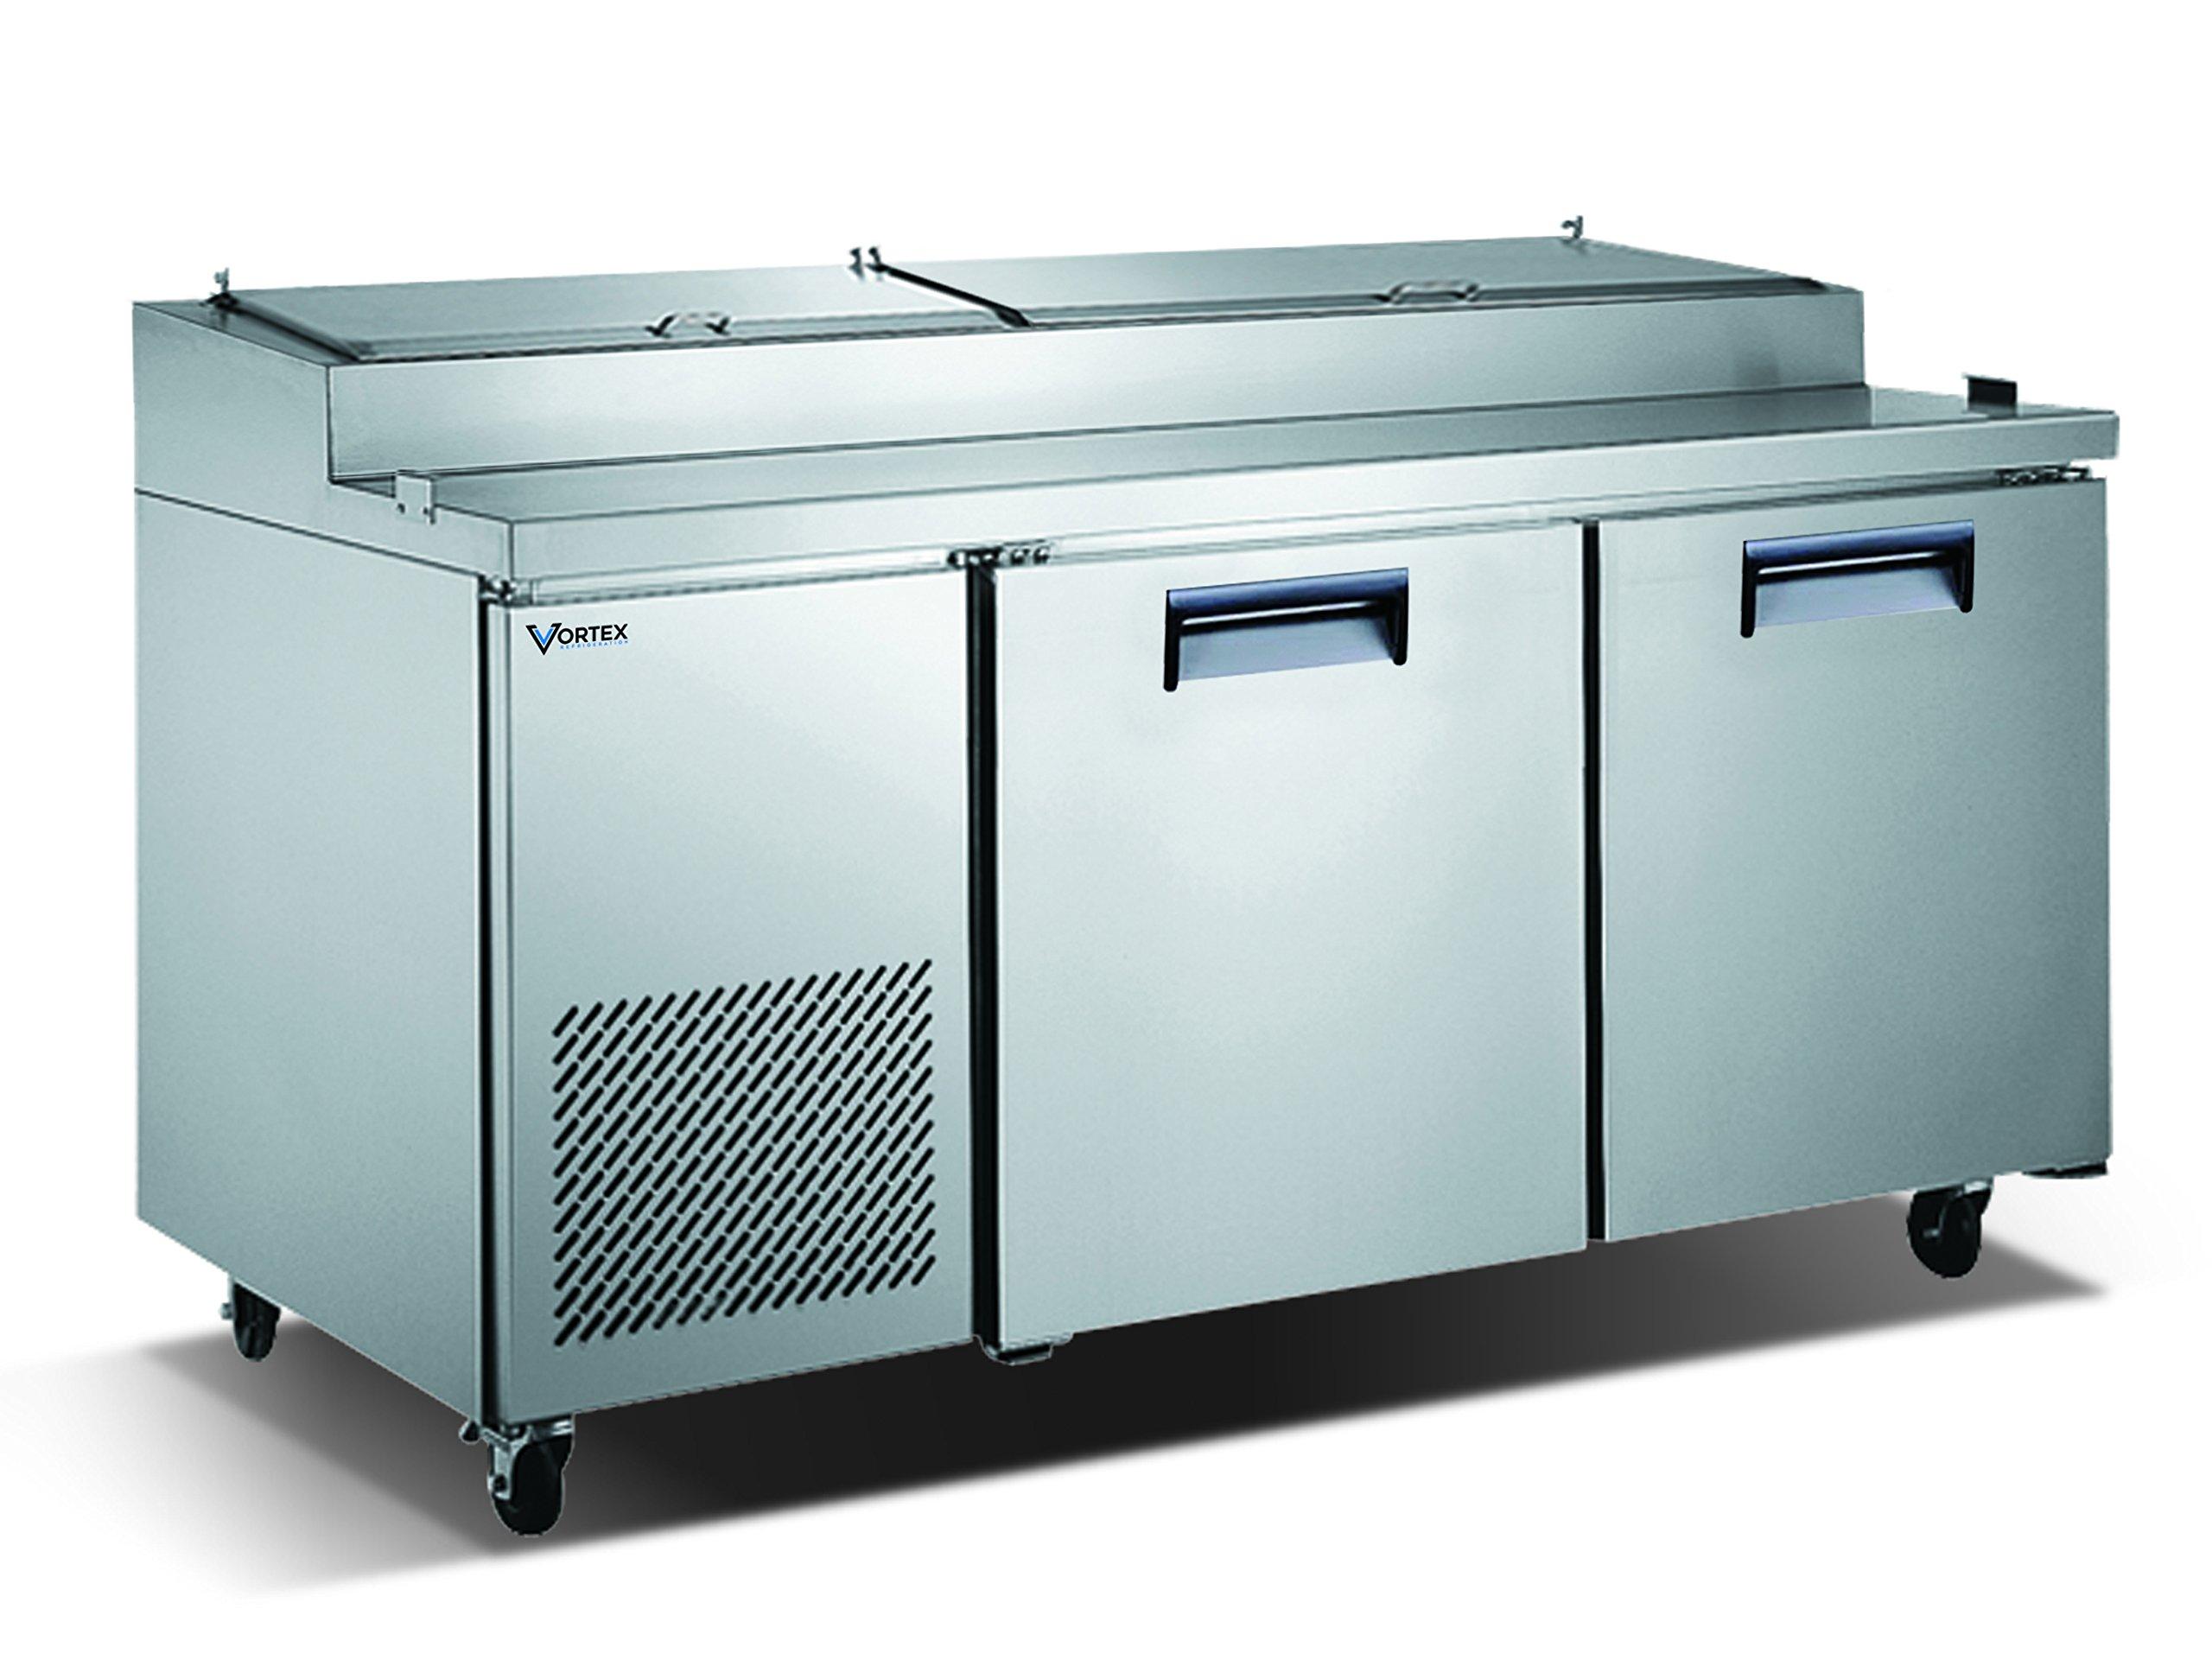 Vortex Refrigeration Commercial 2 Door, 67'' Pizza Prep Table - 16.9 Cu. Ft.